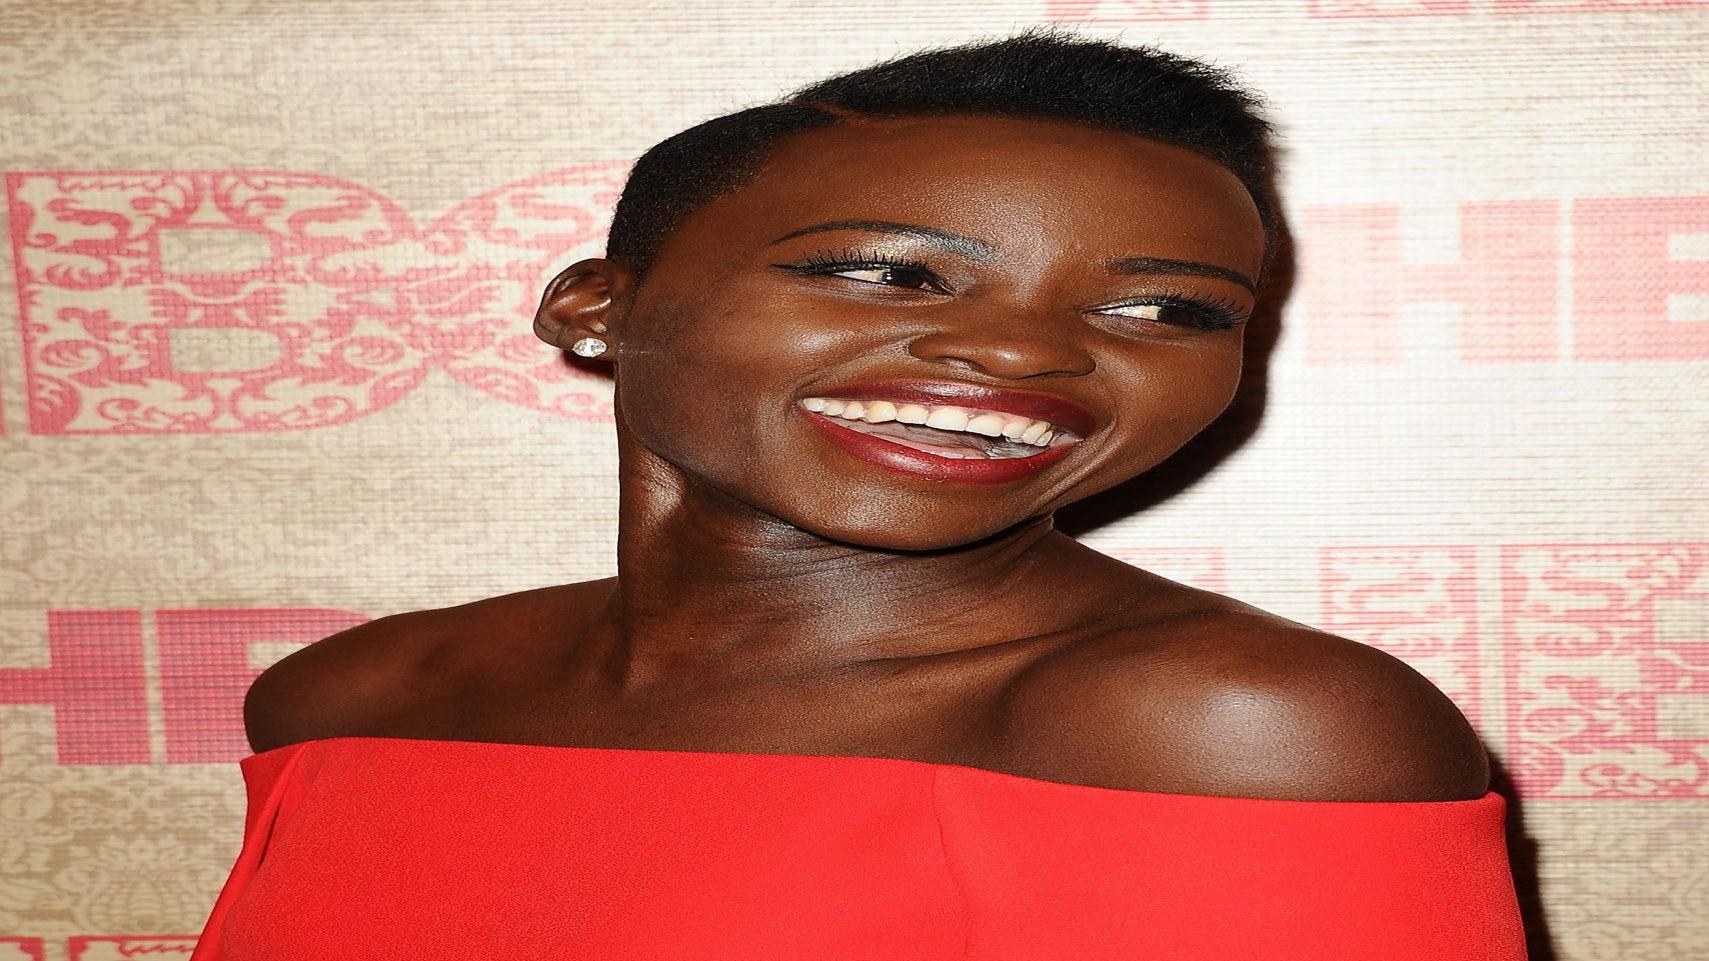 Report: Kenyan School Renamed After Lupita Nyong'o